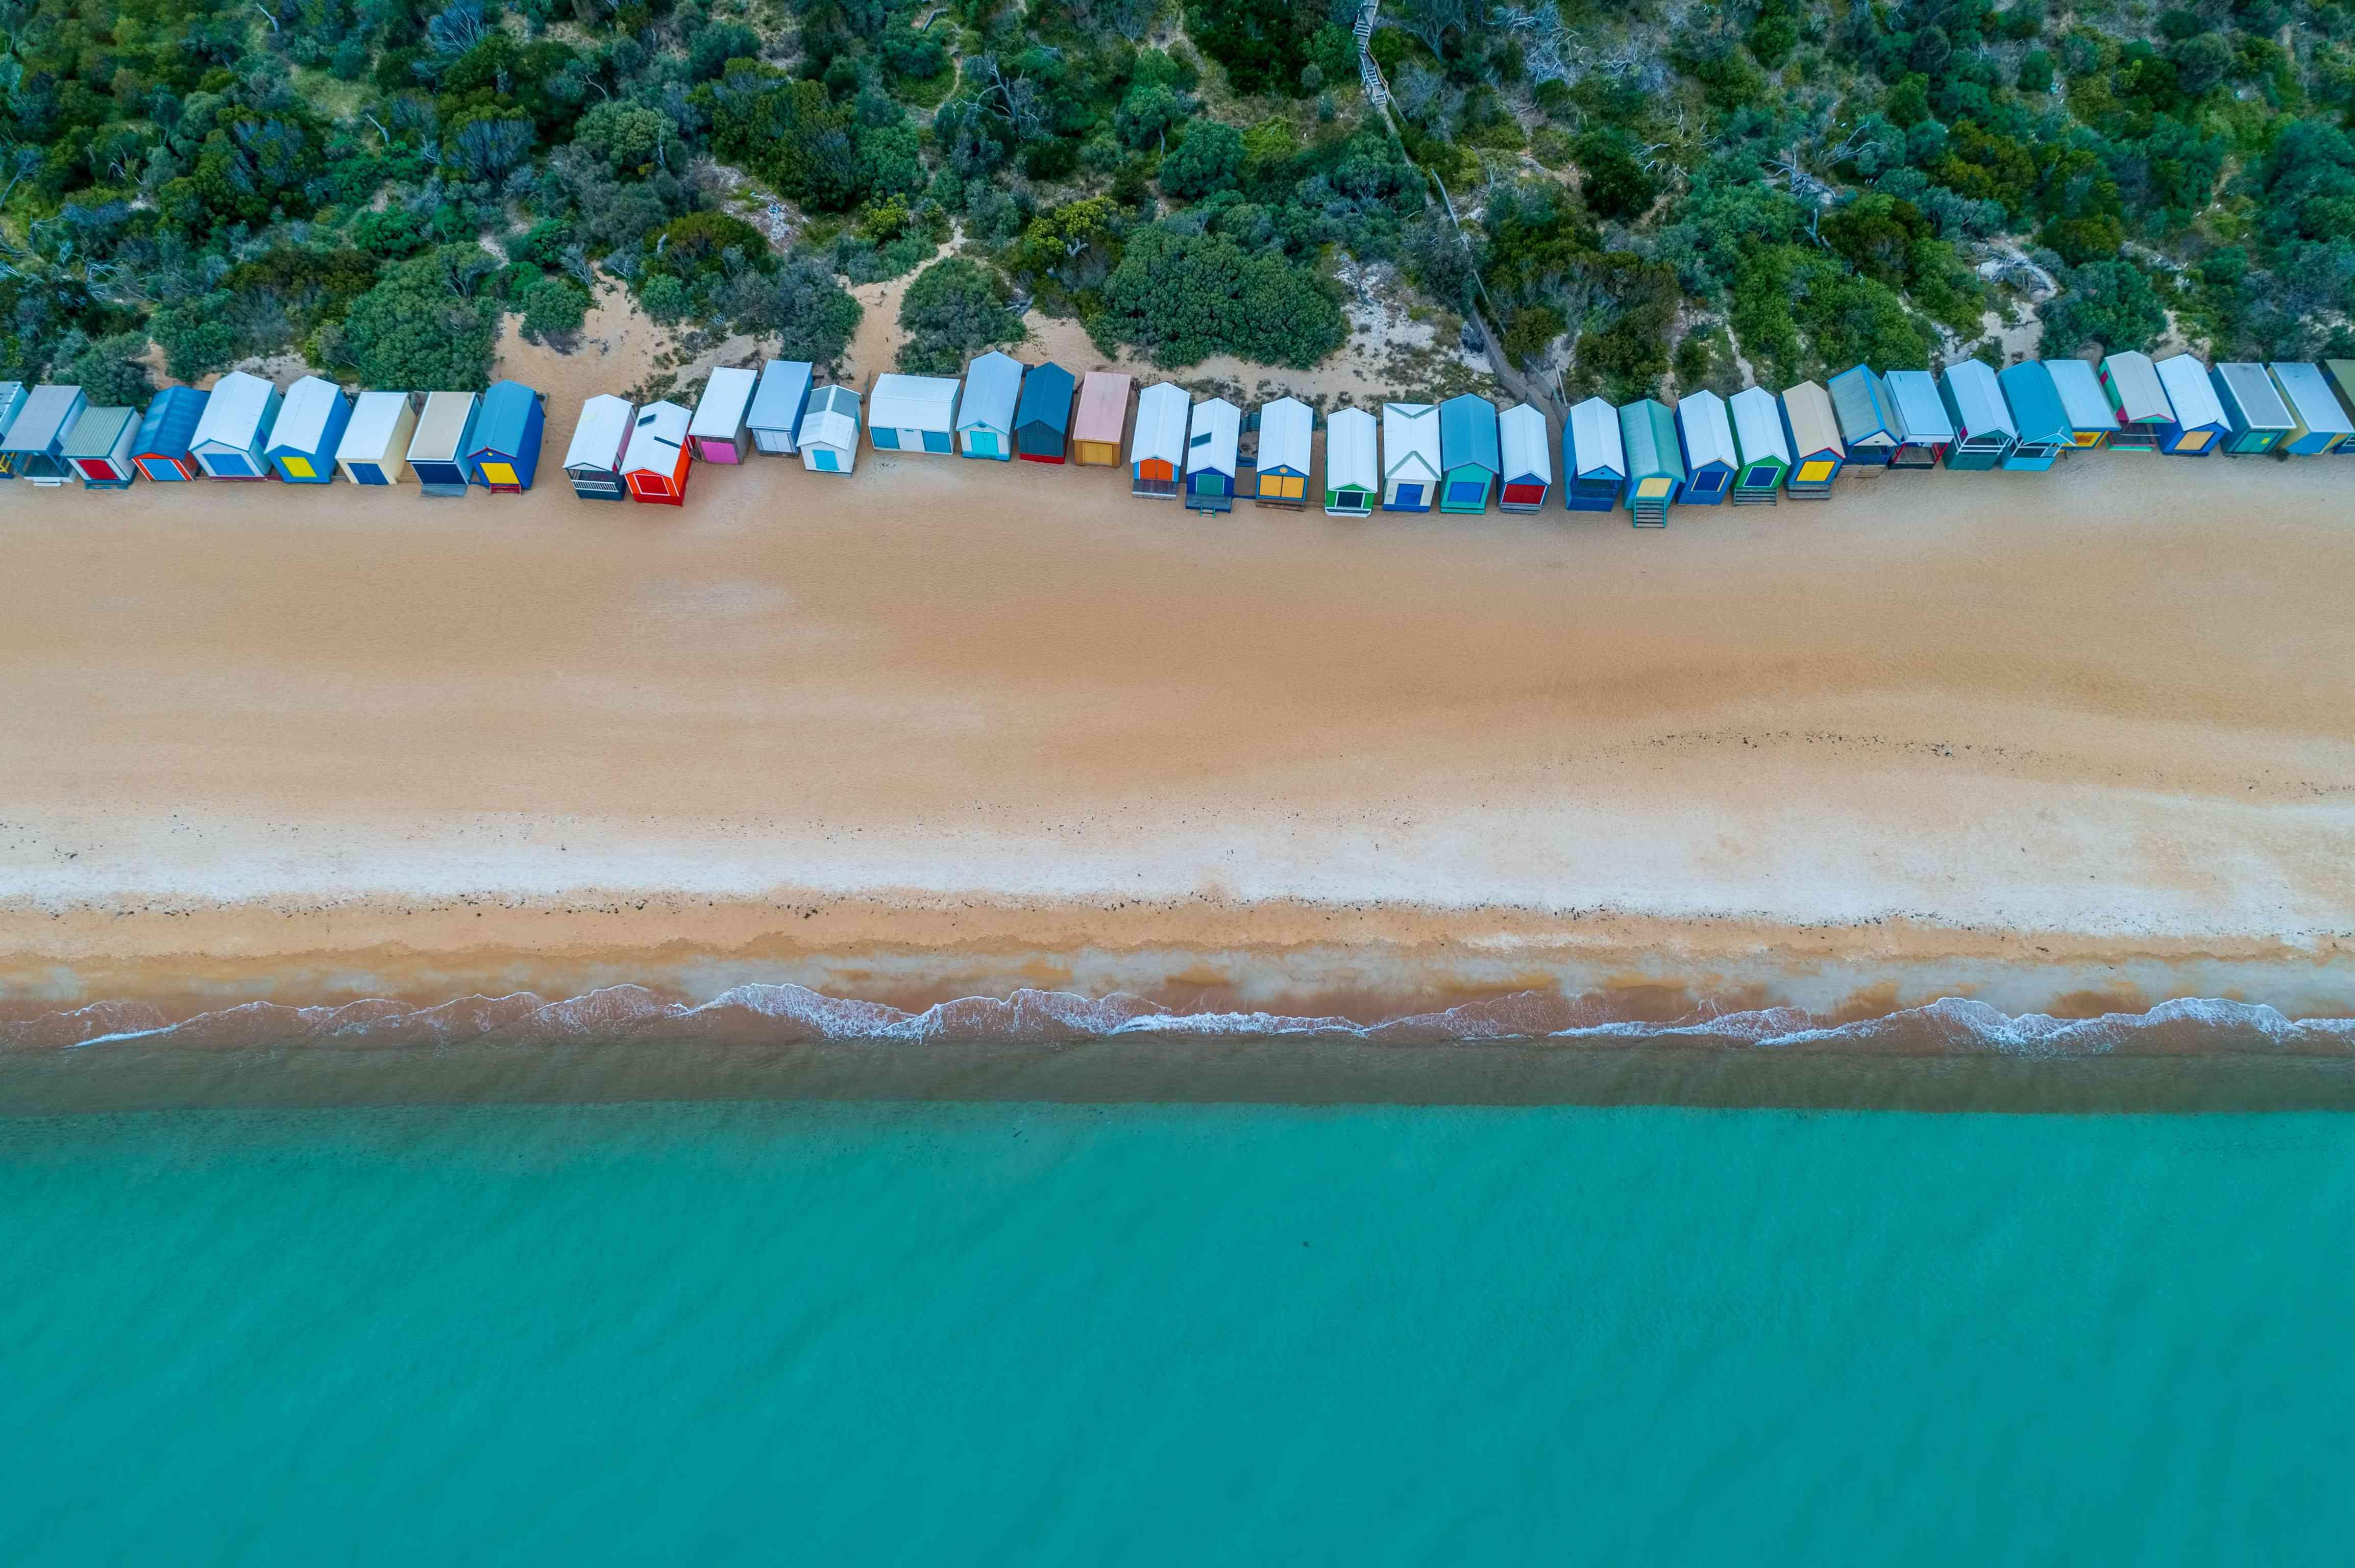 Iconic beach huts in Melbourne, Australia - aerial view